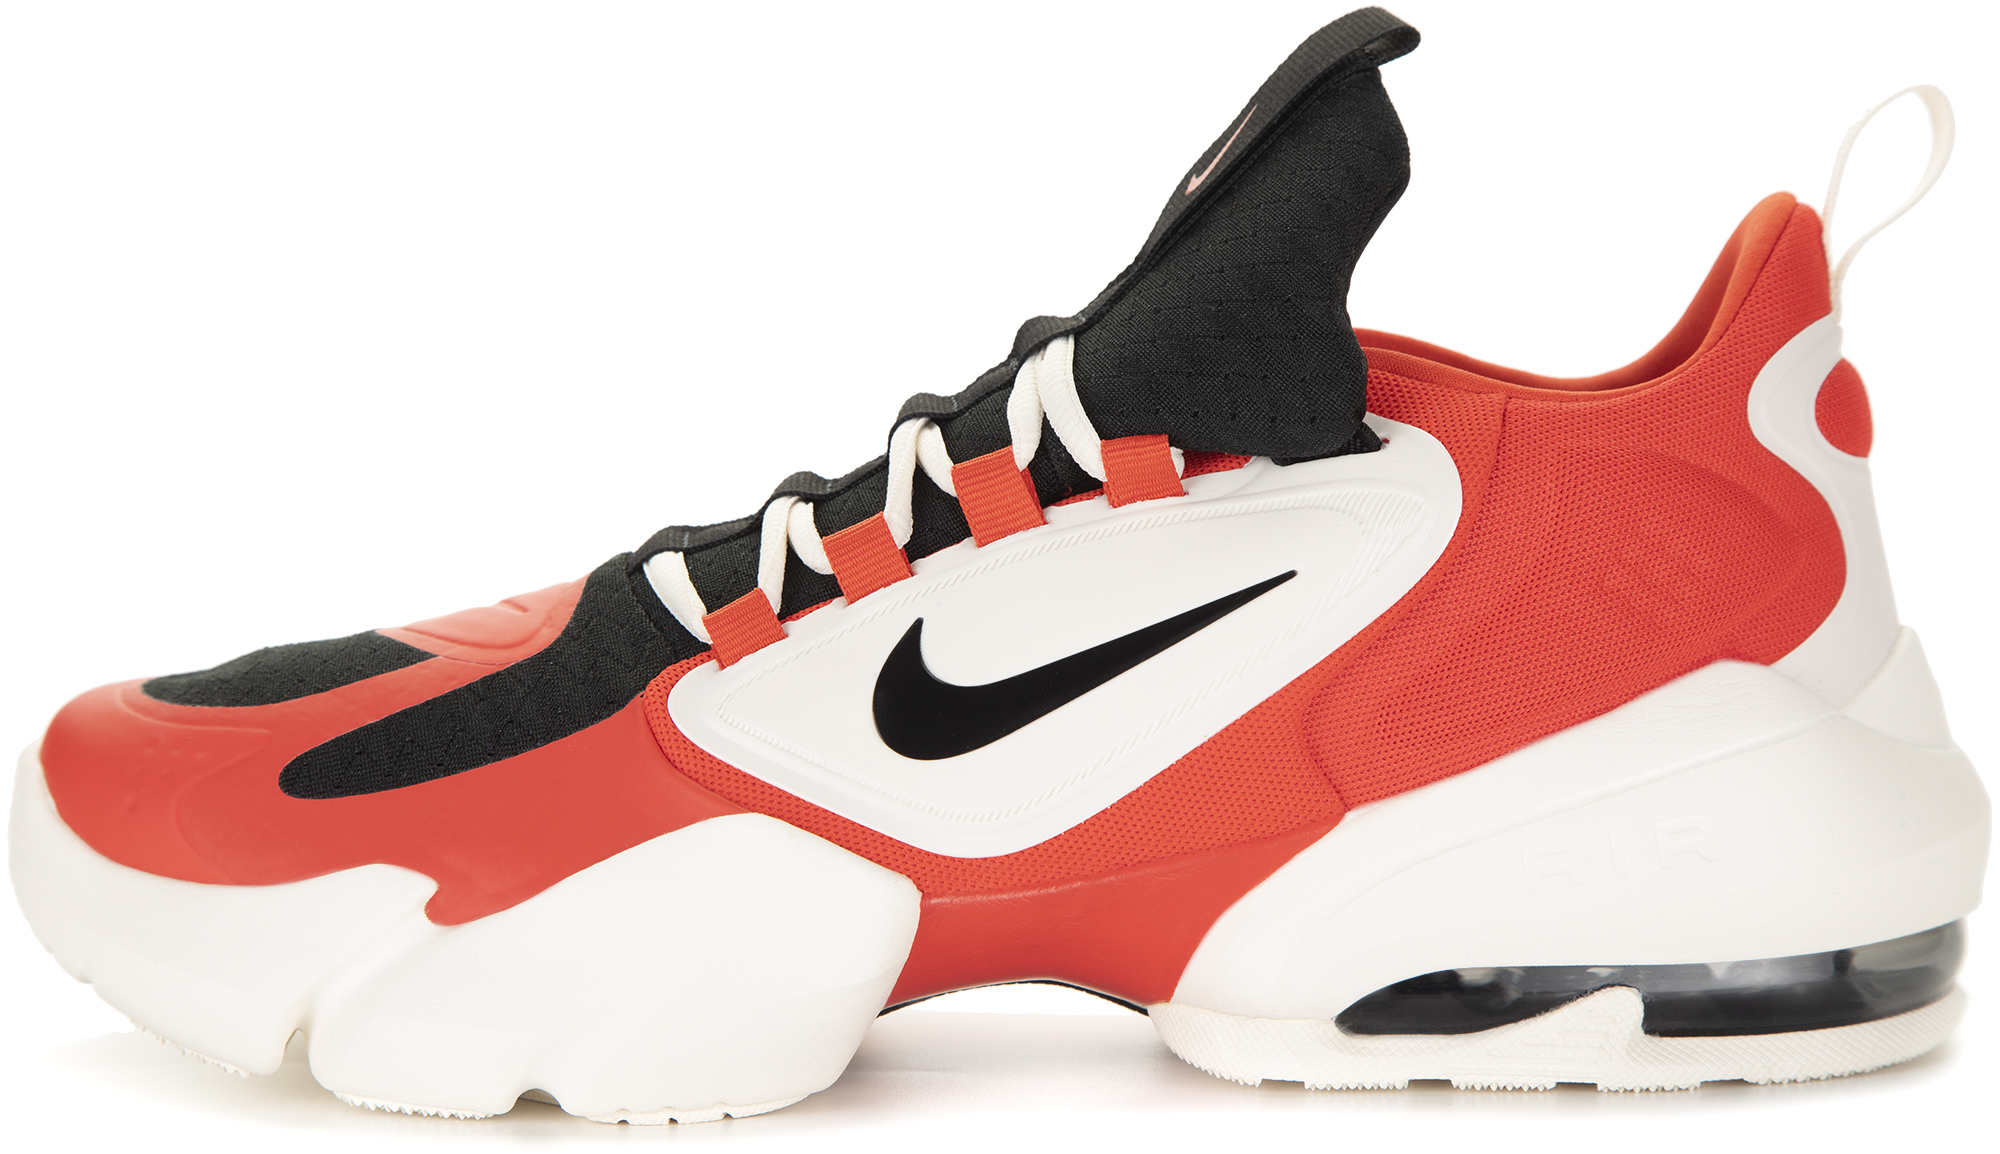 Nike Кроссовки мужские Nike Air Max Alpha Savage, размер 44 кроссовки nike air max prime sl 876069 003